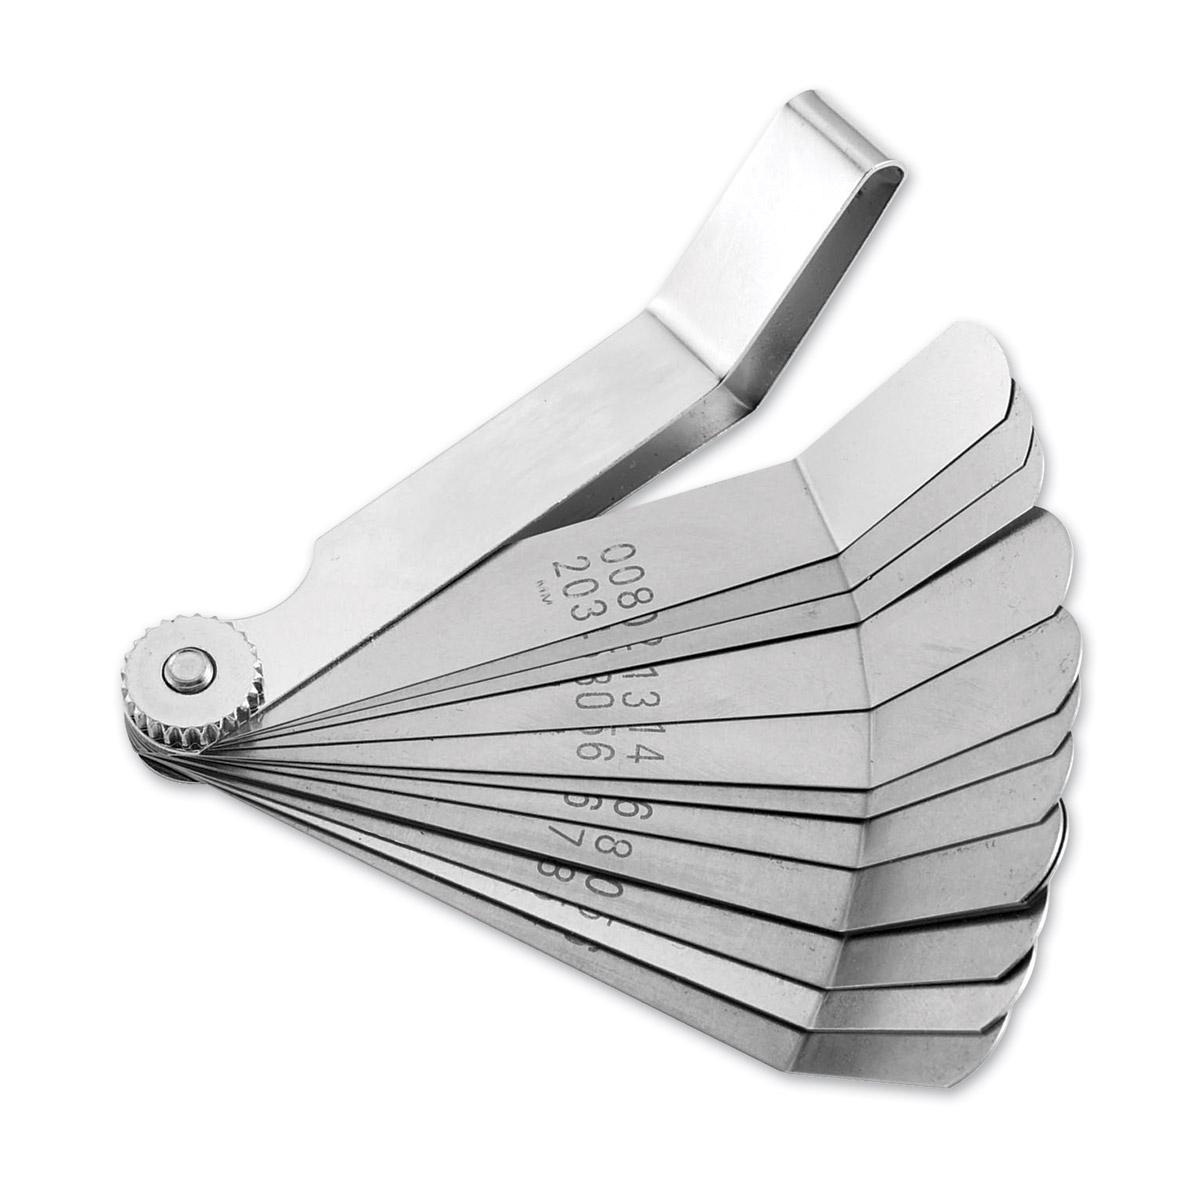 BikeMaster 12-Blade Combination Tappet & Feeler Gauge Set